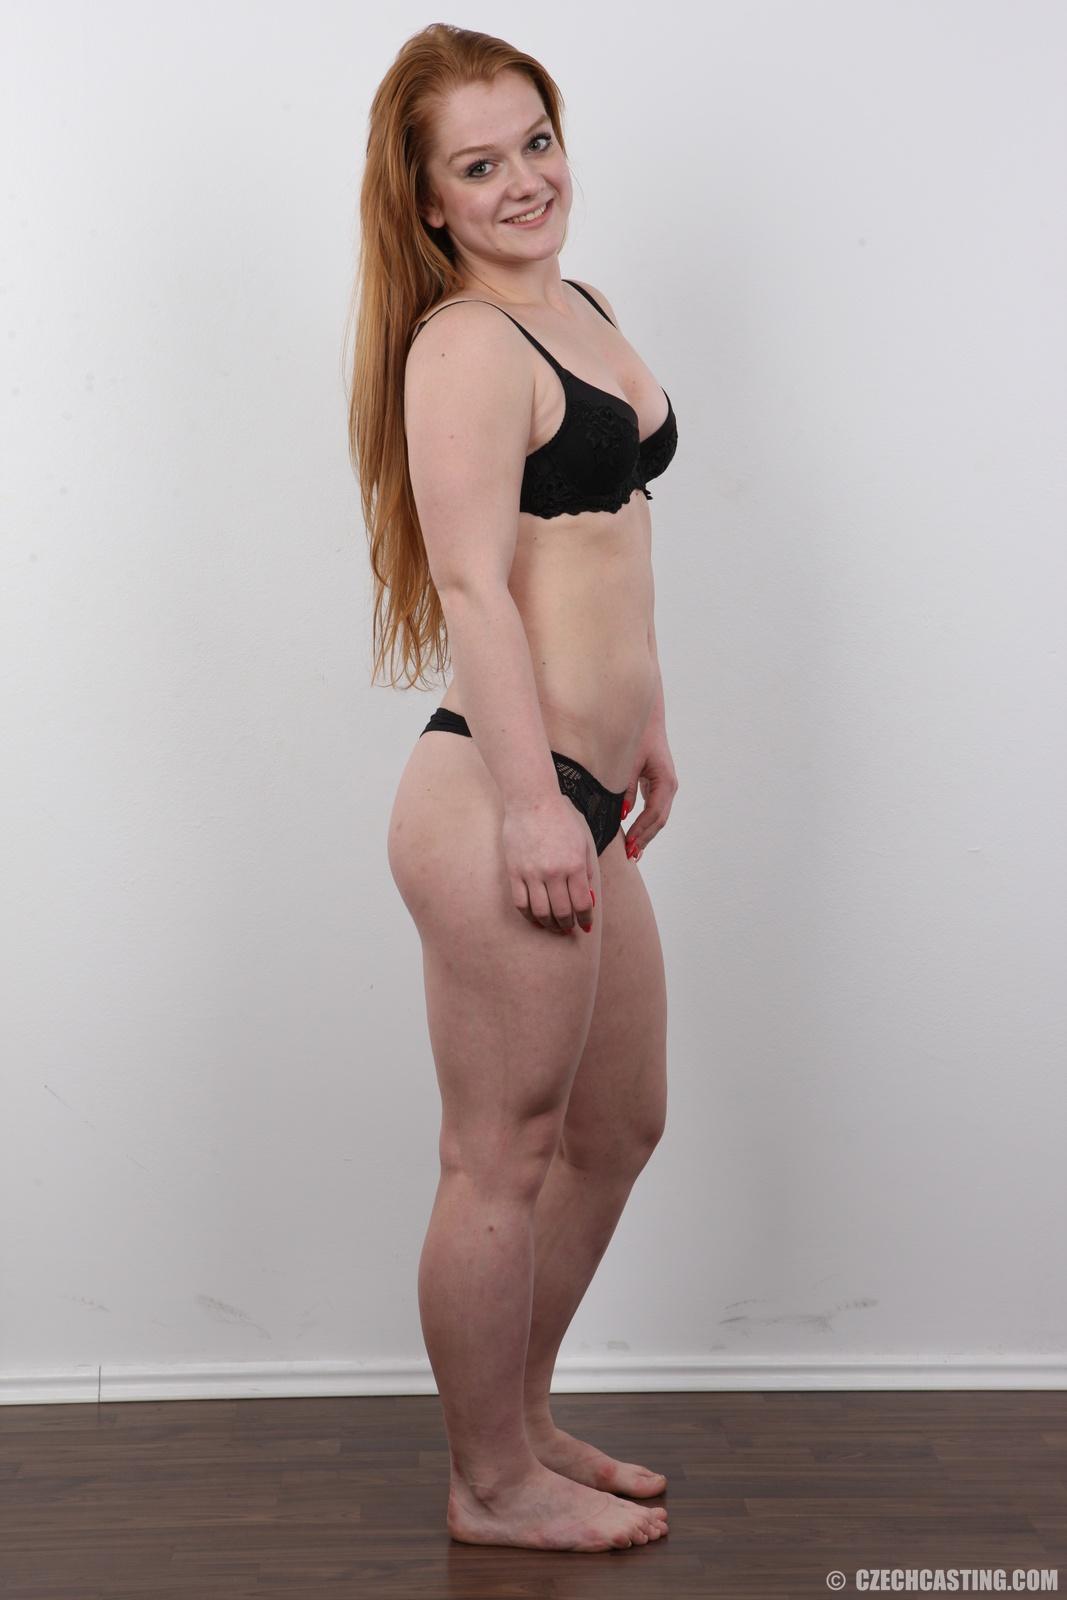 wpid-18-year-old-eliska-casting-photos13.jpg